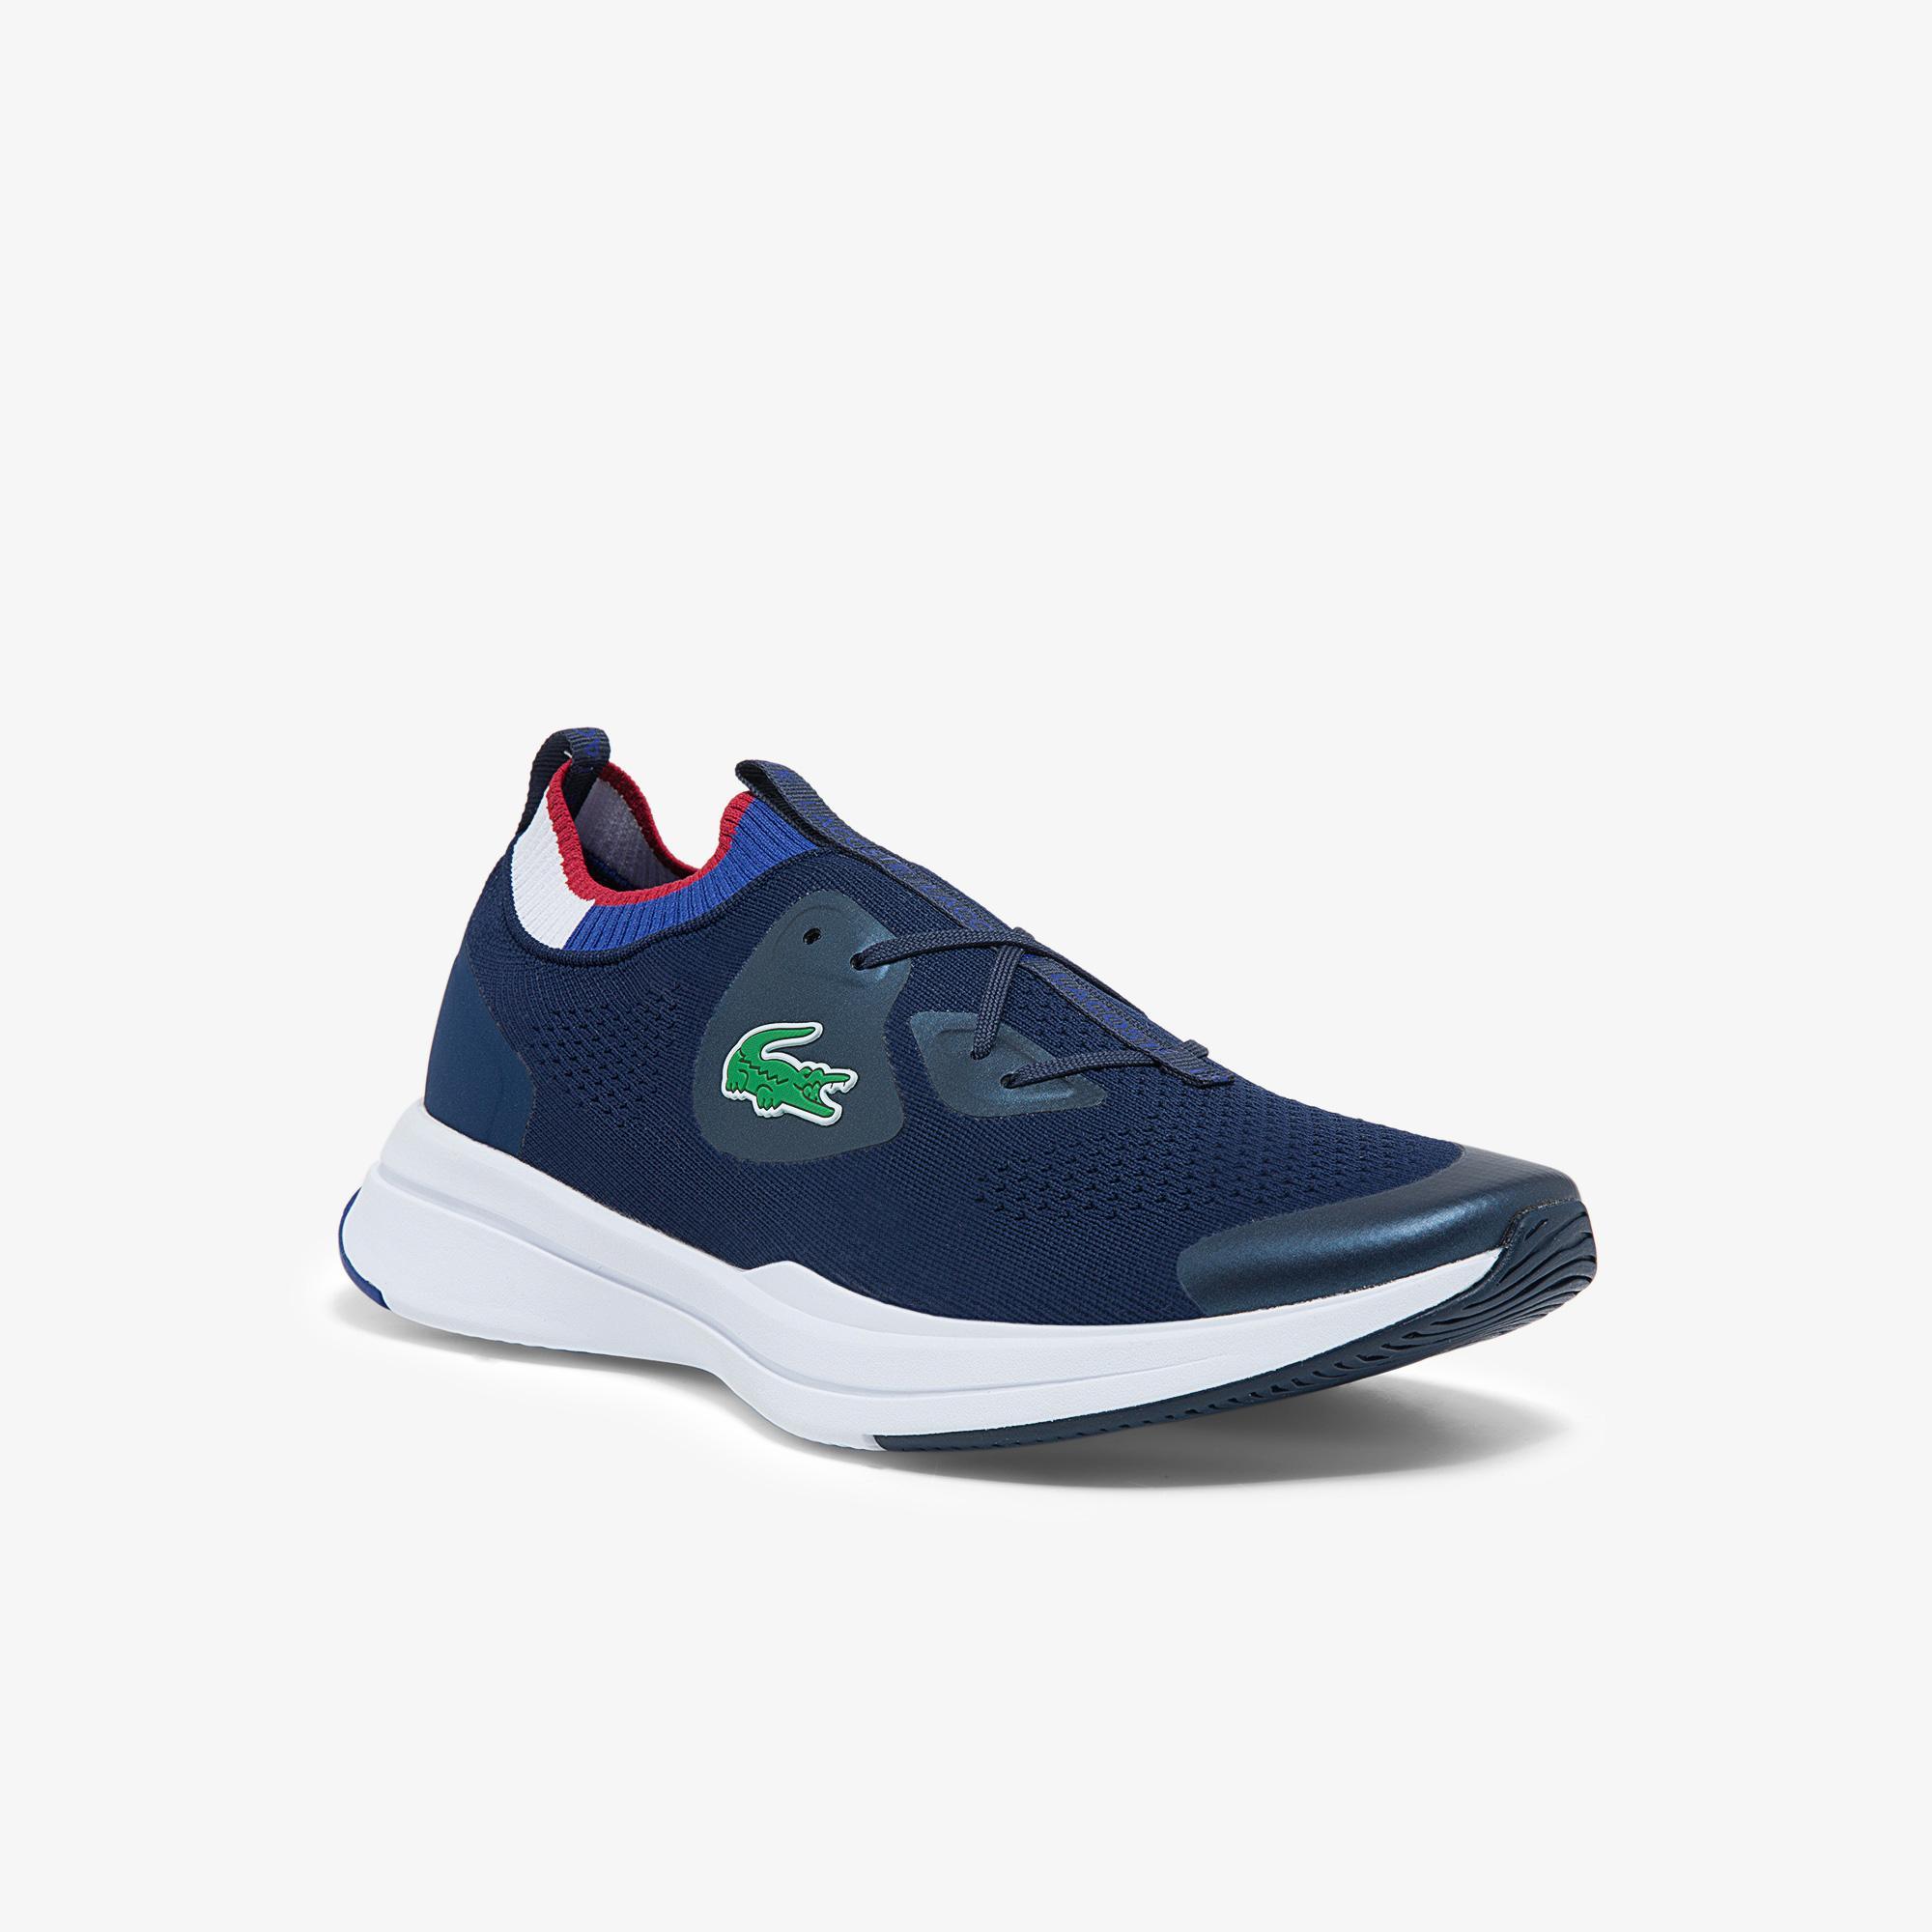 Lacoste Run Spin Knit 0121 1 Sma Erkek Lacivert Sneaker